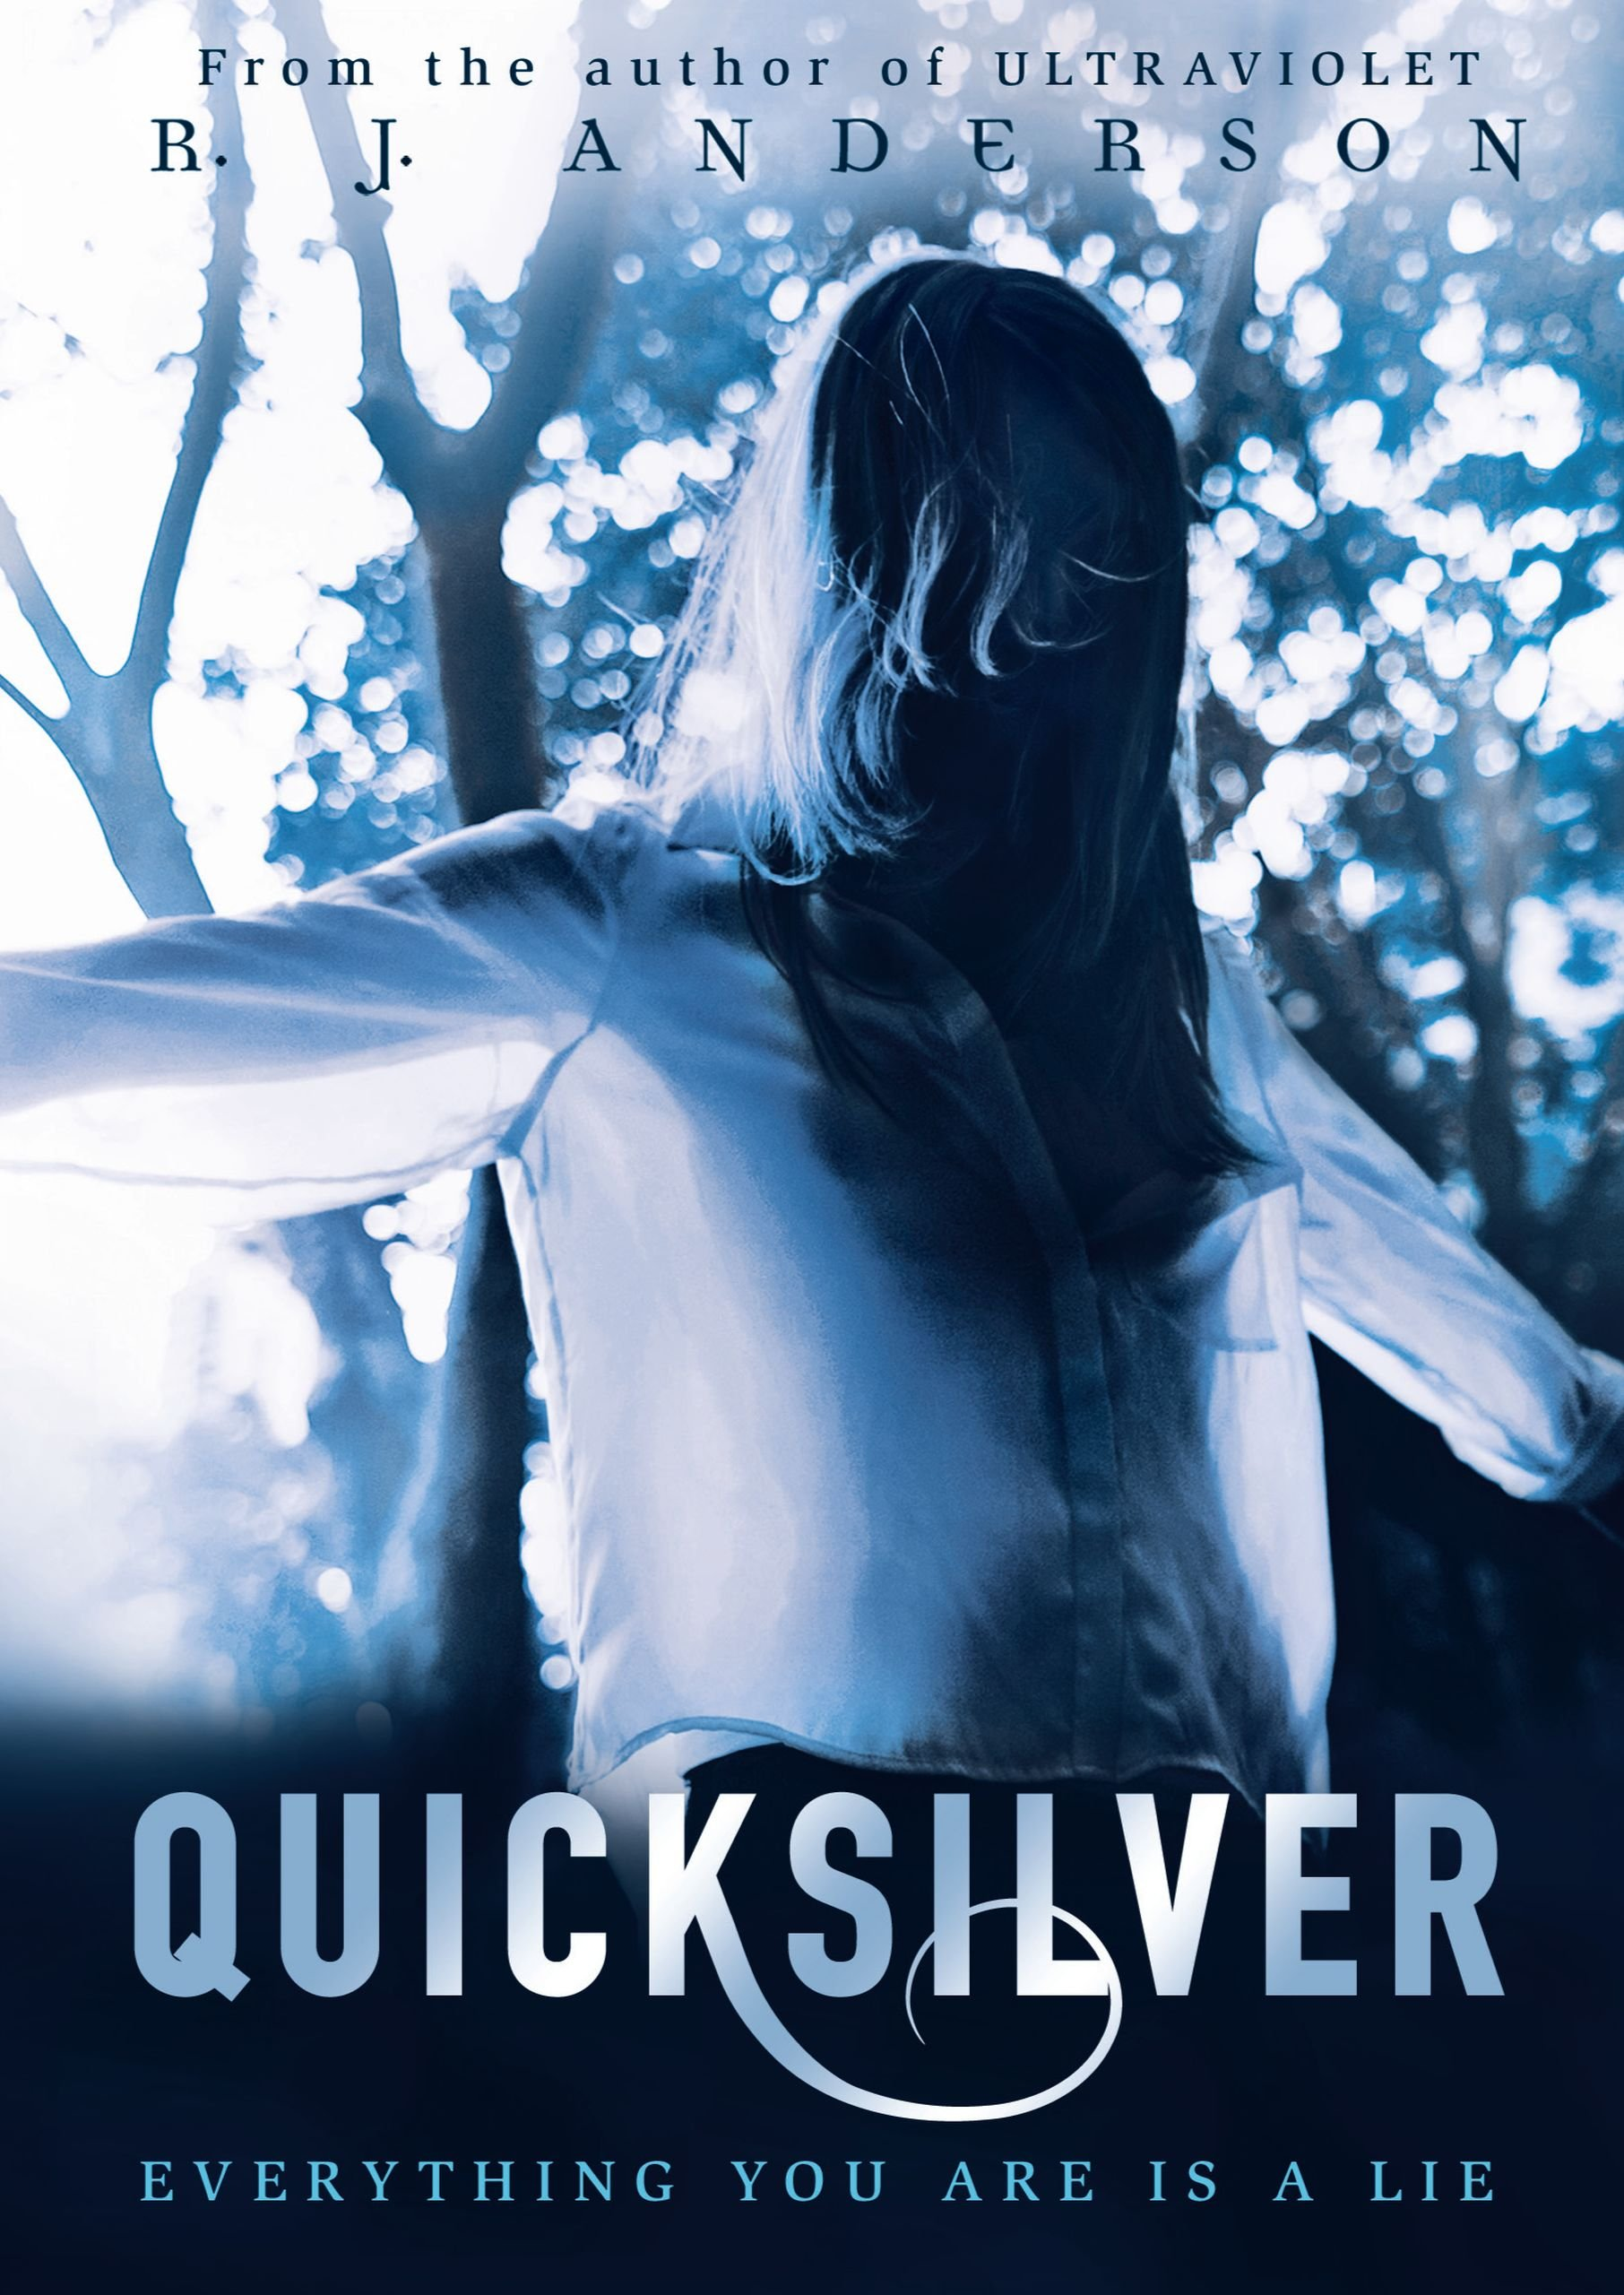 couverture de Quicksilver de R.J. Anderson